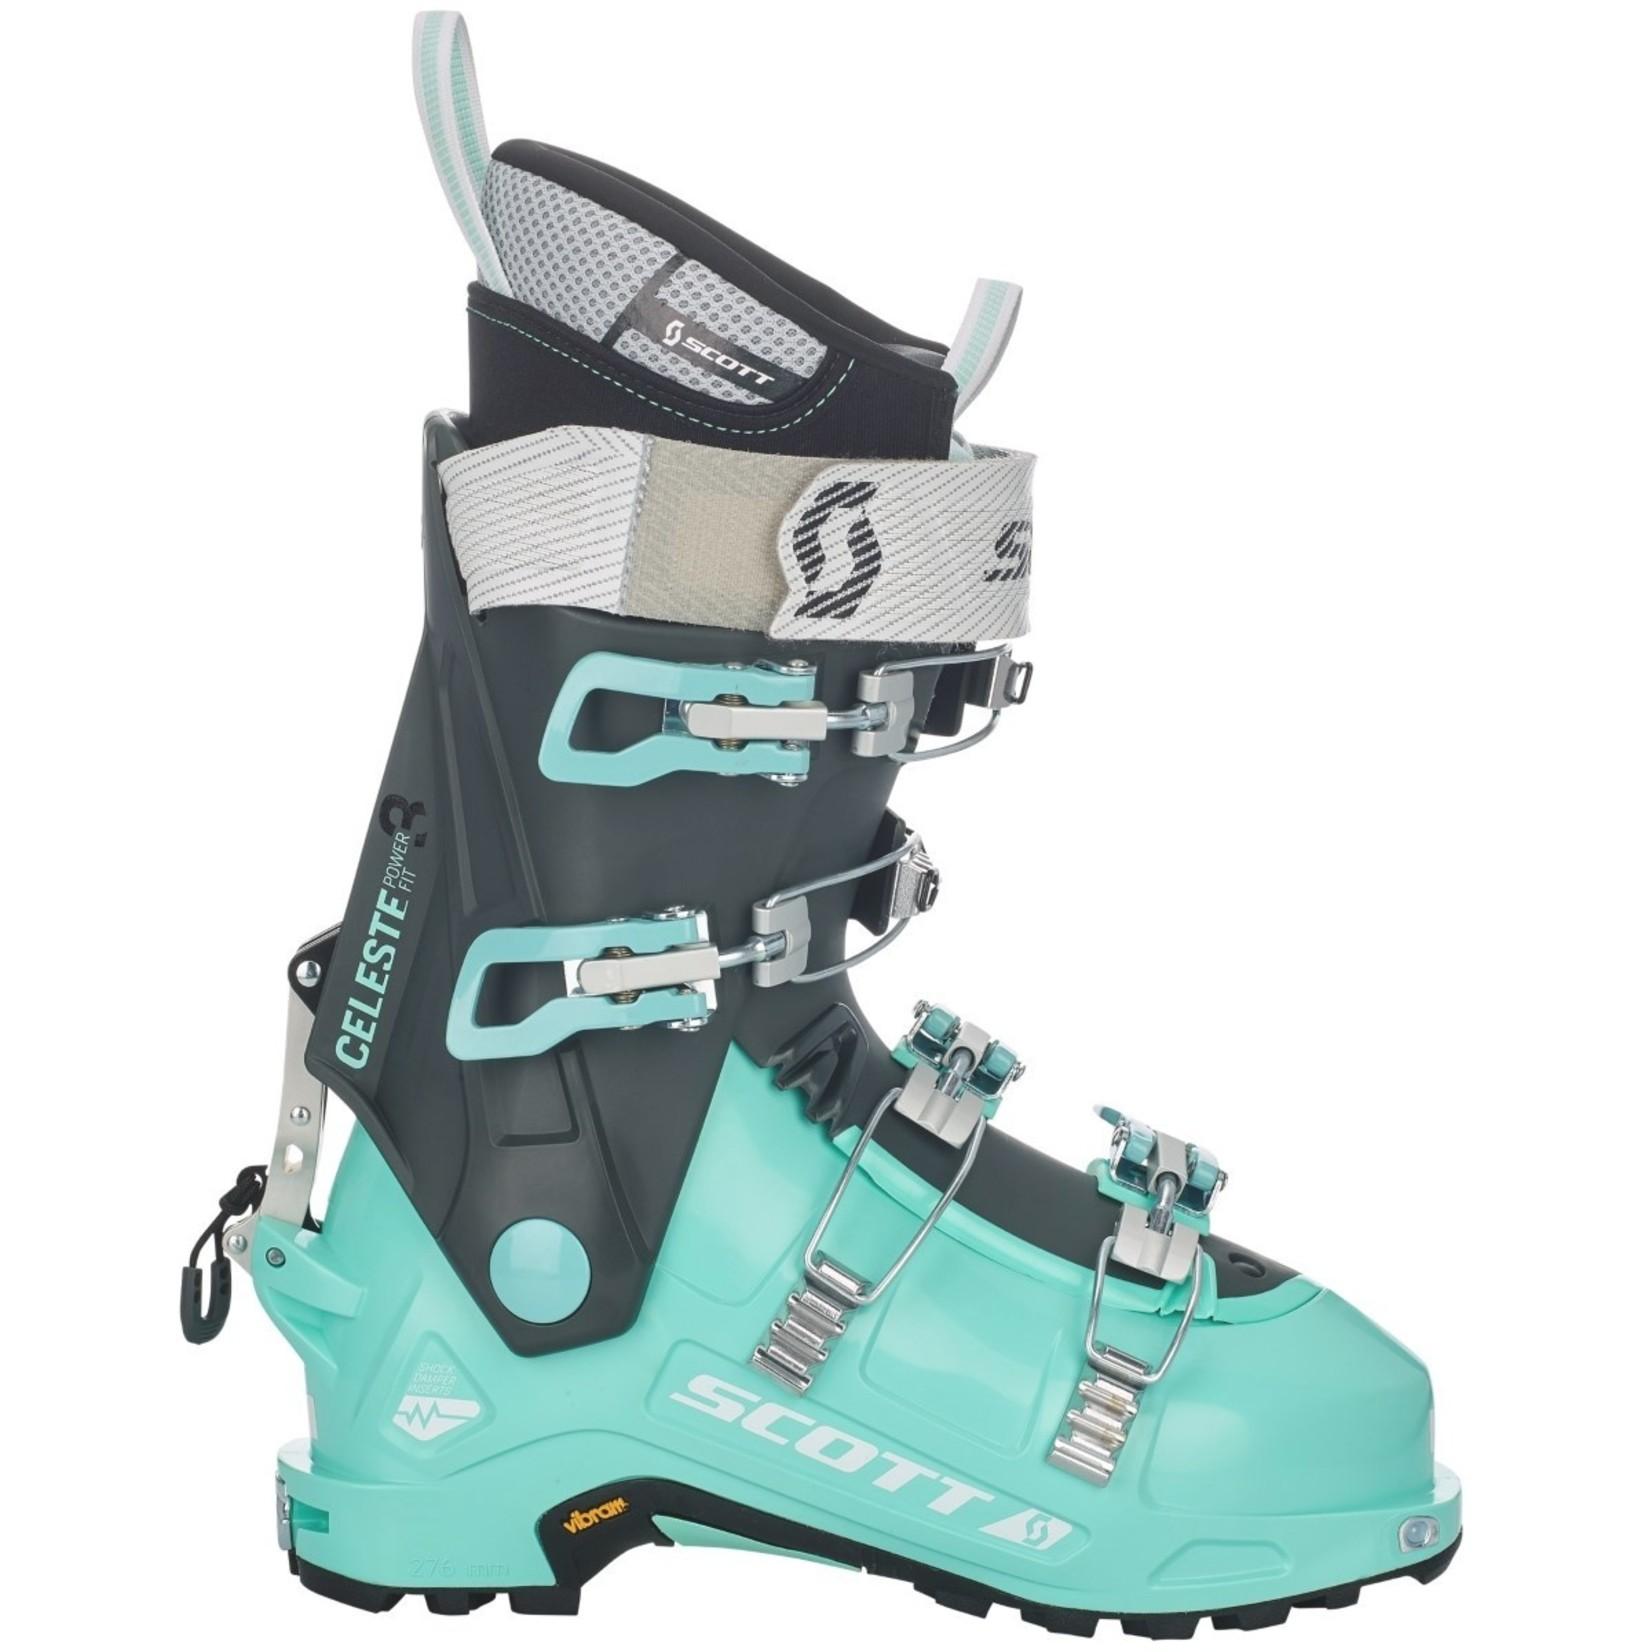 Scott Scott Celeste III Ski Boot - Women